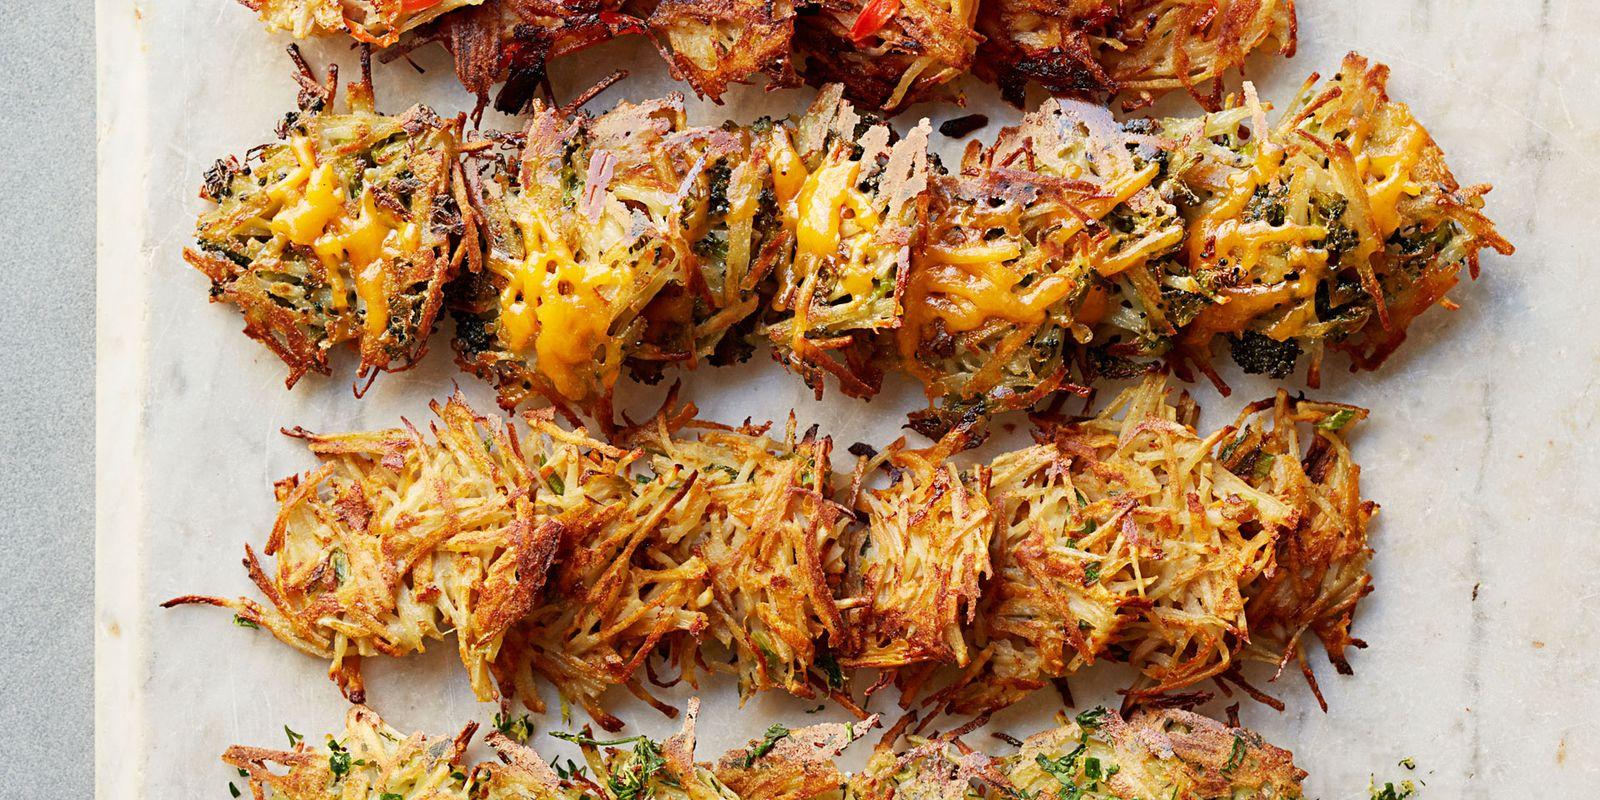 Garlicky Broccoli Cheddar Hash Browns Recipe